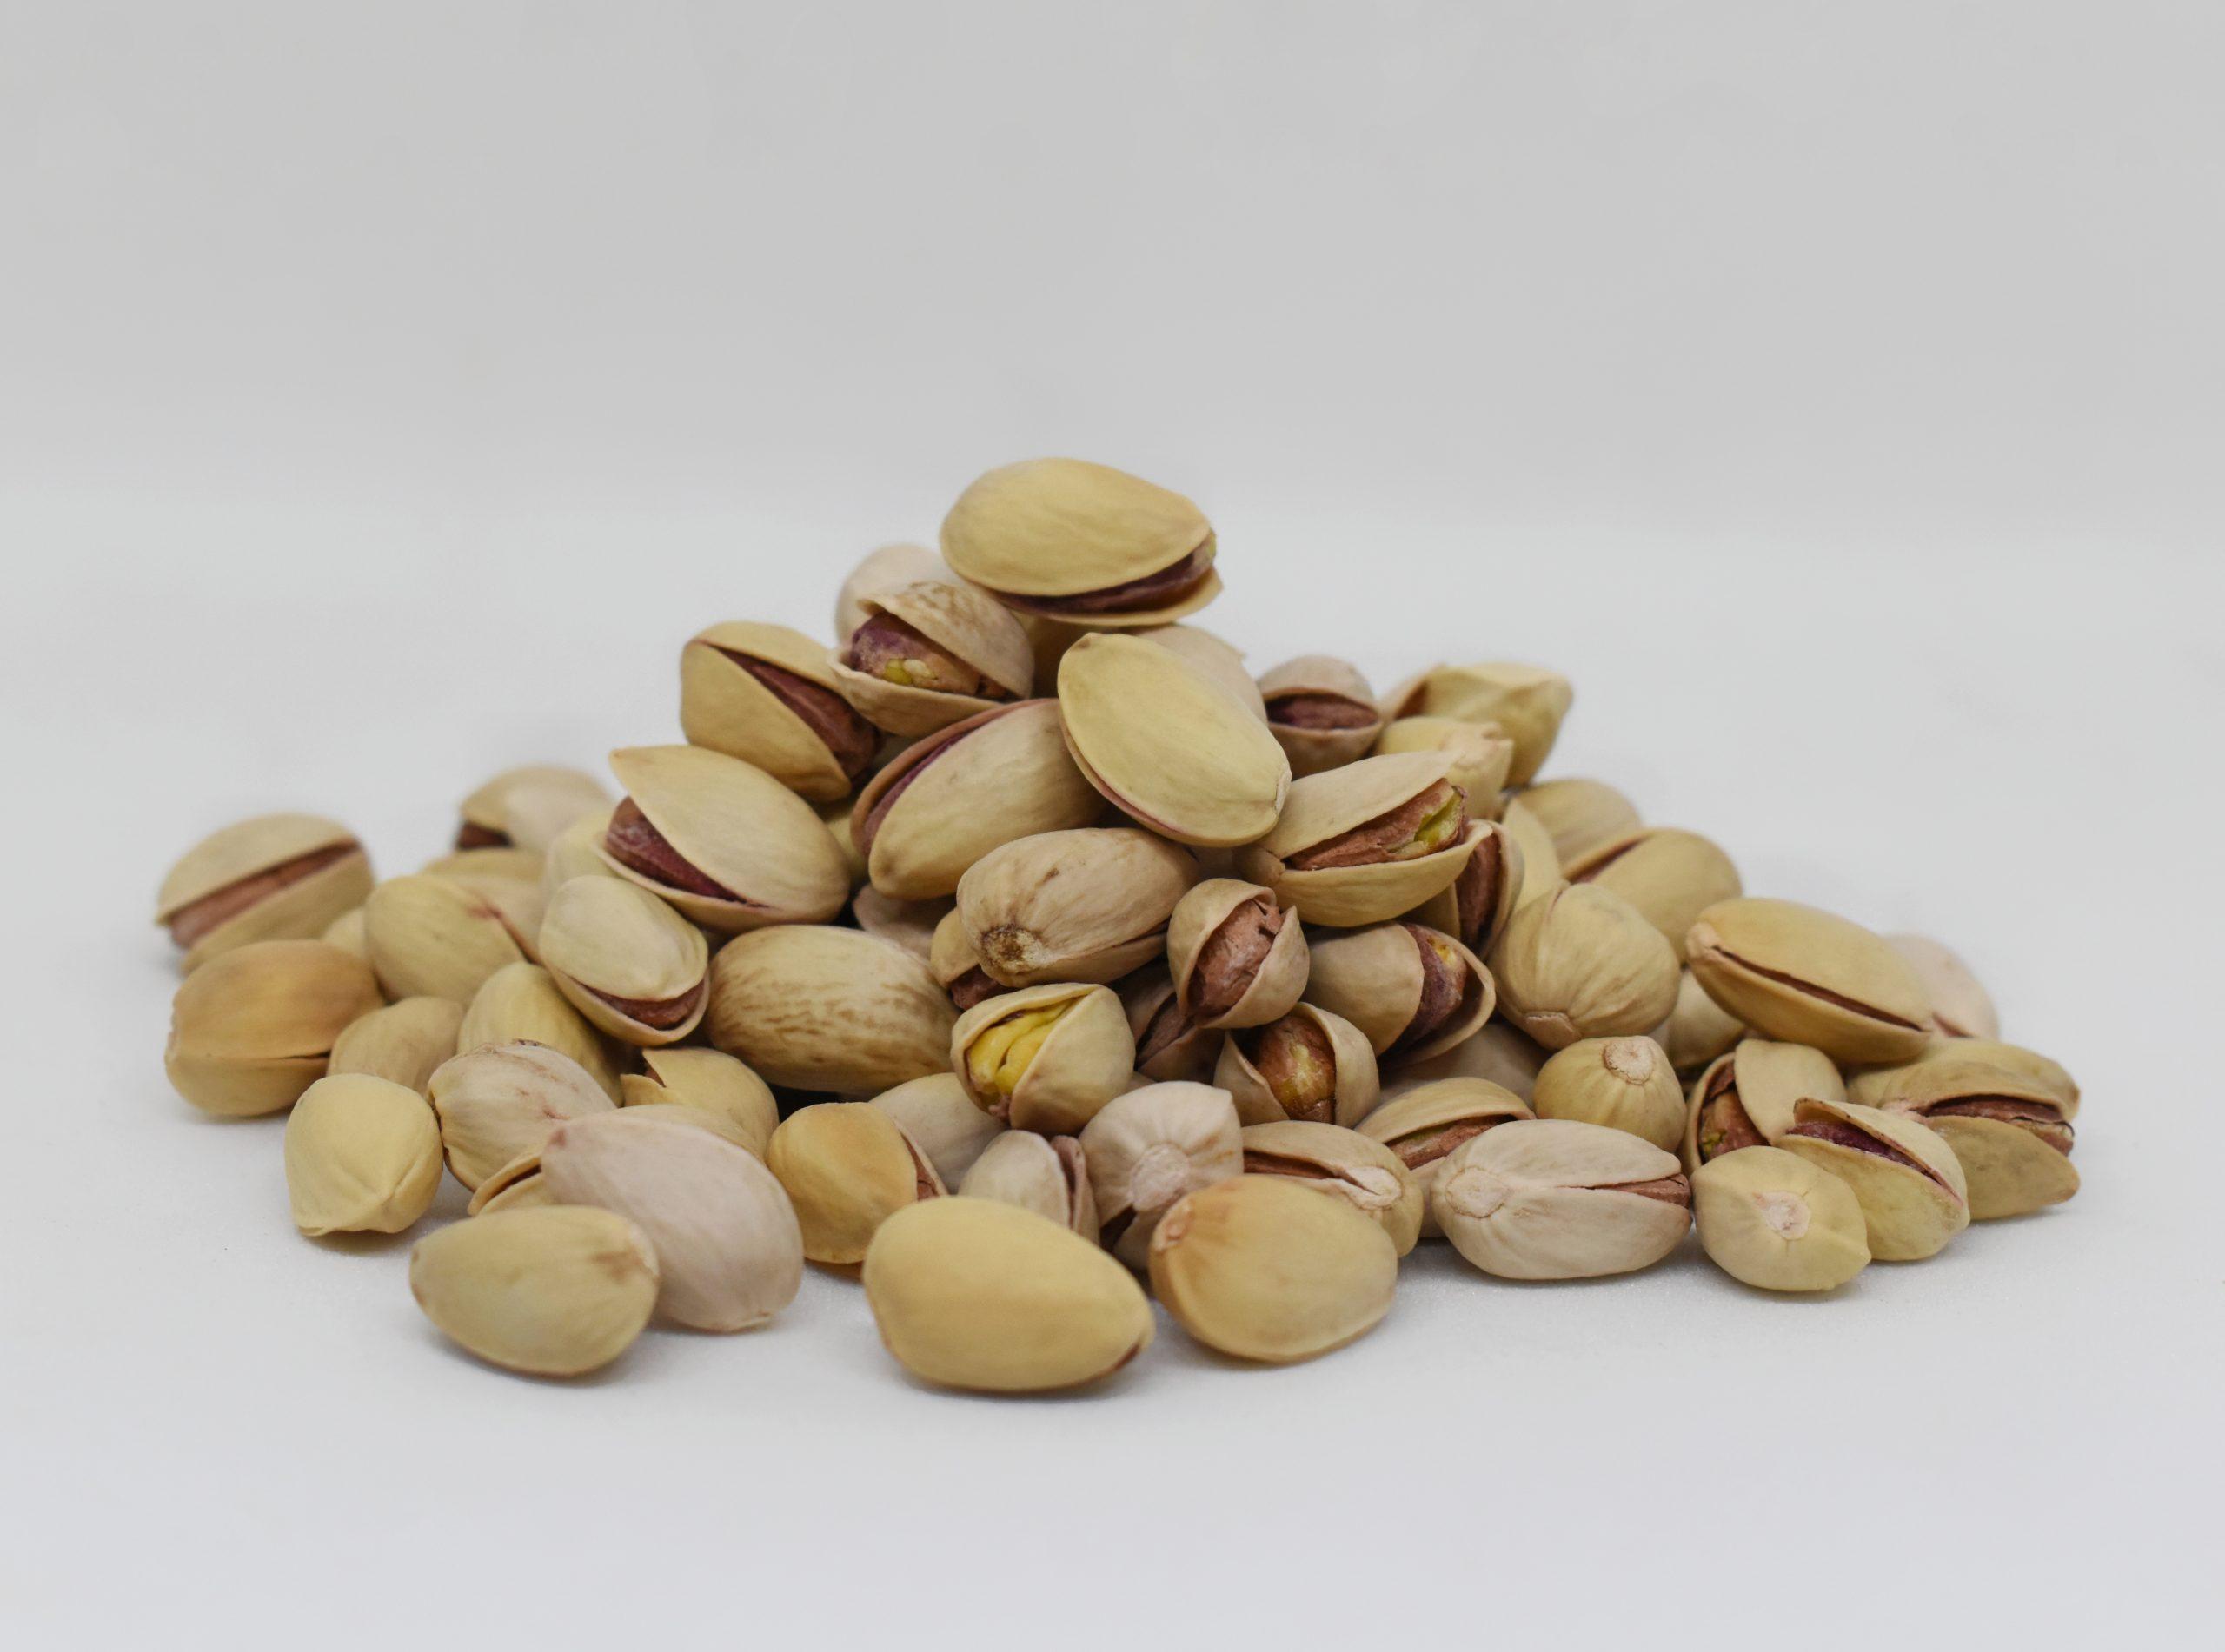 Pistachio for healthy diet